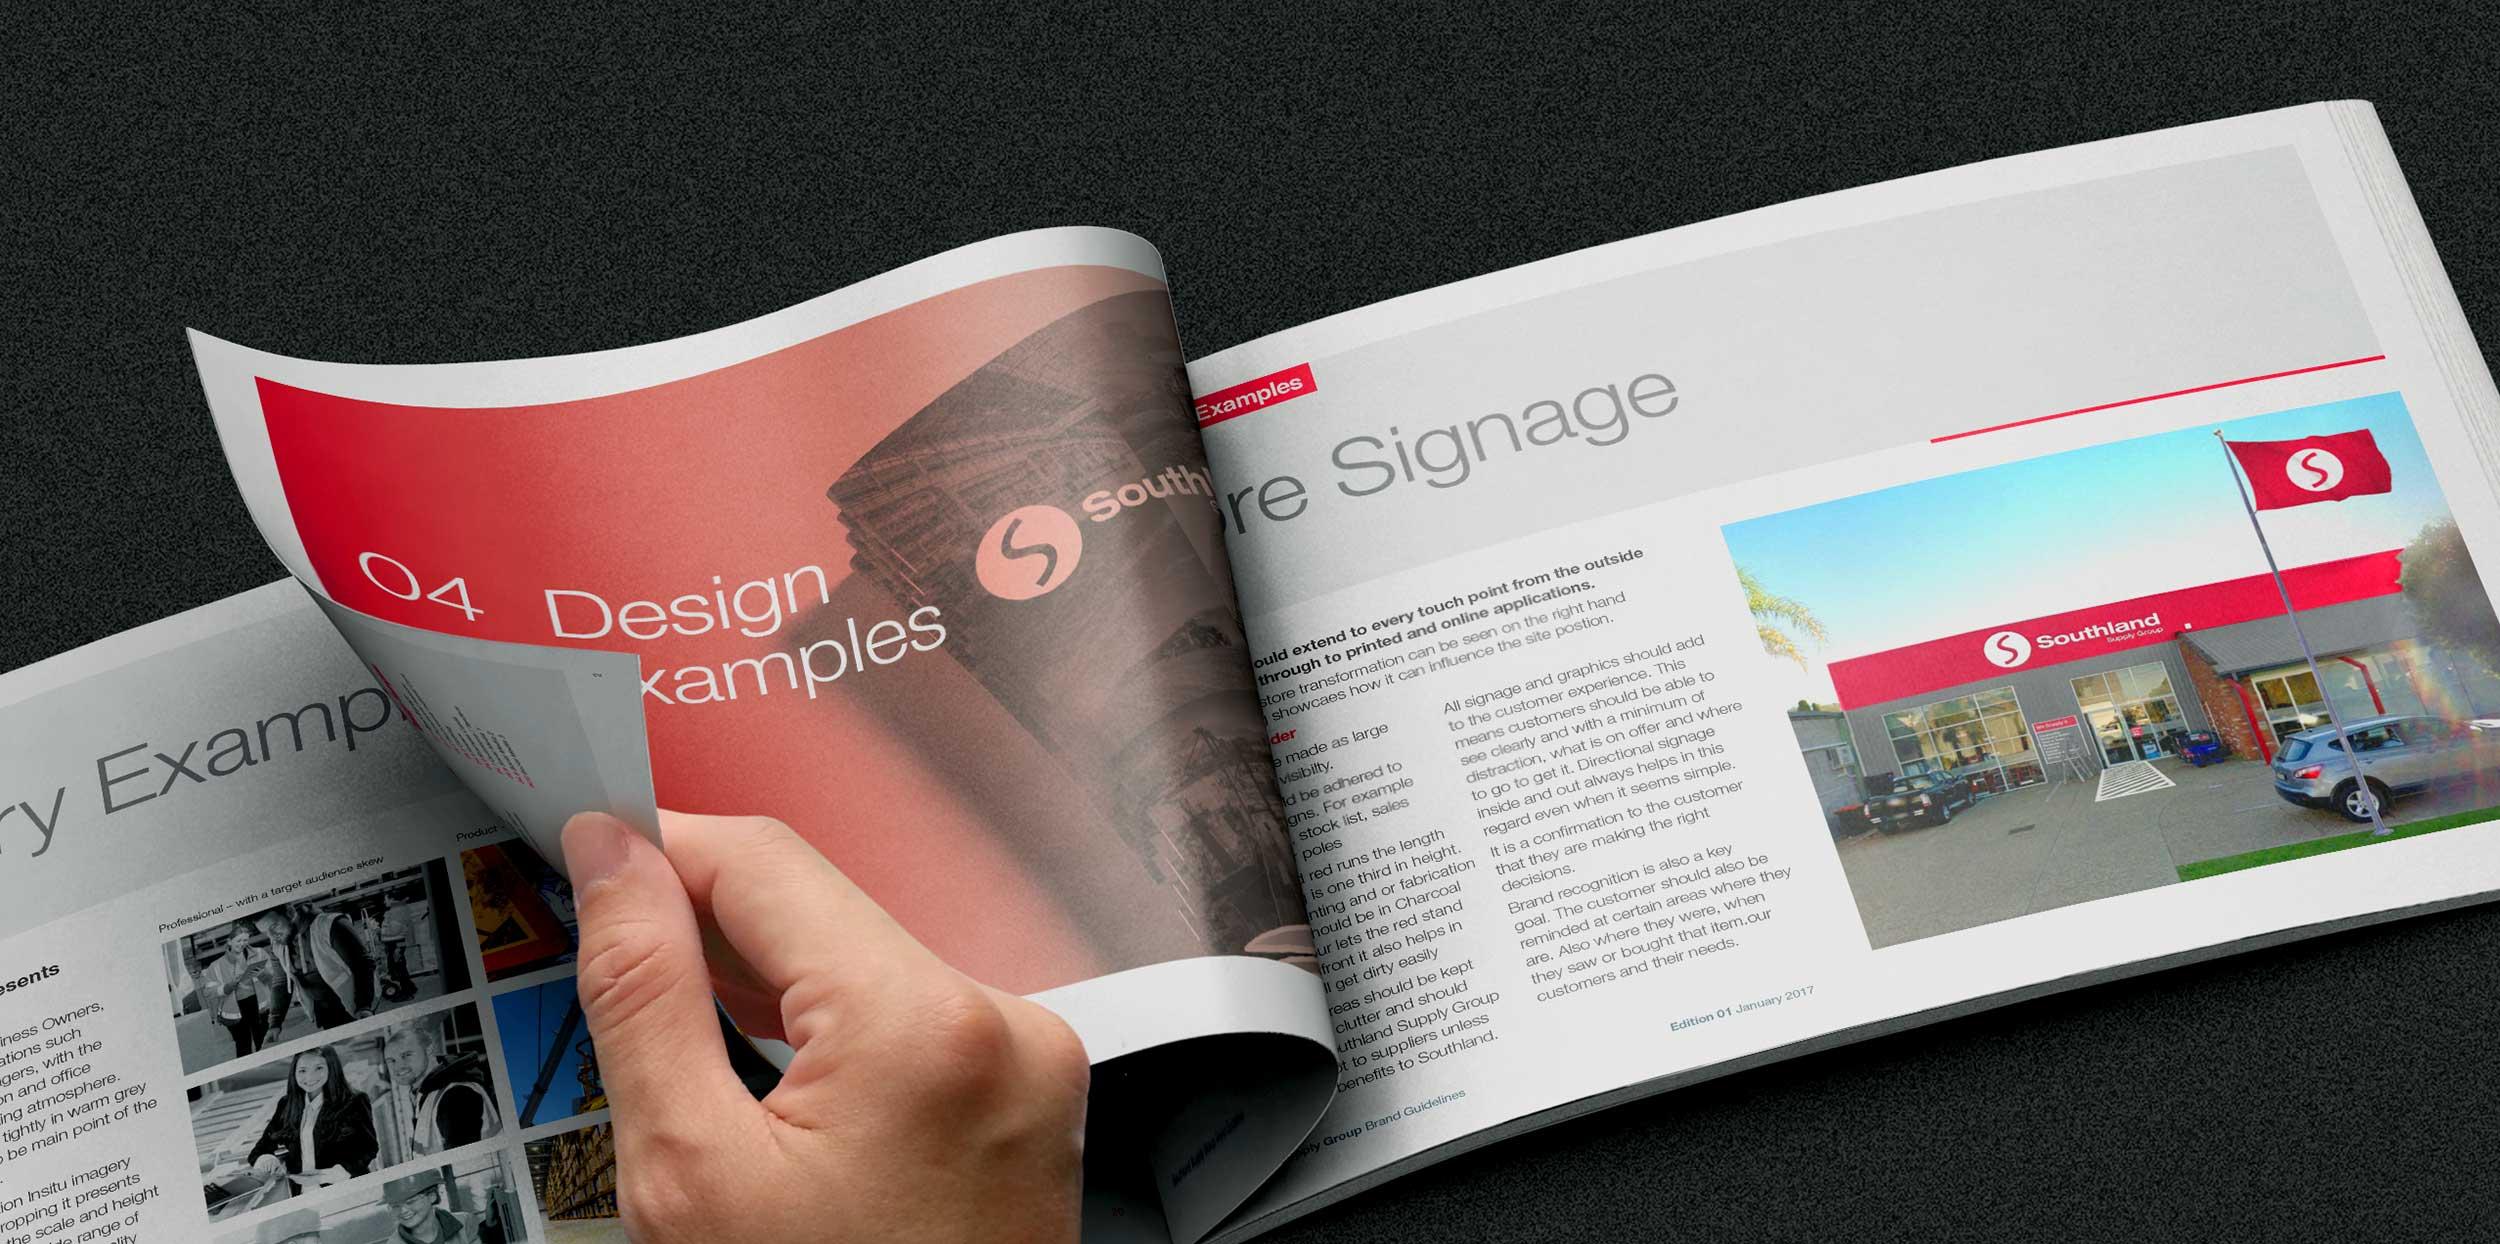 Handle-Sydney-Branding_Guidelines_Branding-Southland_1C.jpg